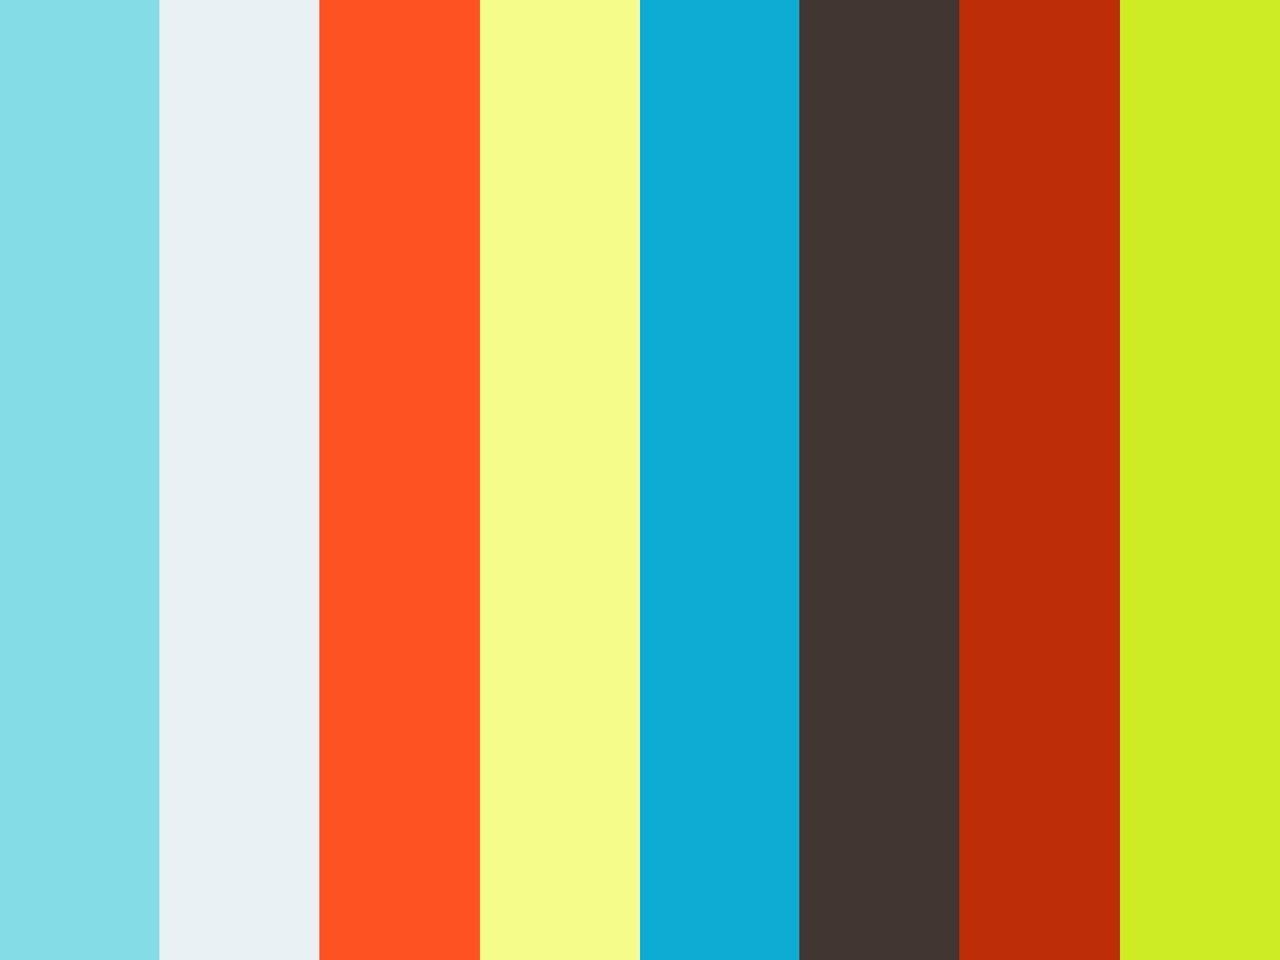 RED BULL // HYPEBEAST - RUGMAN